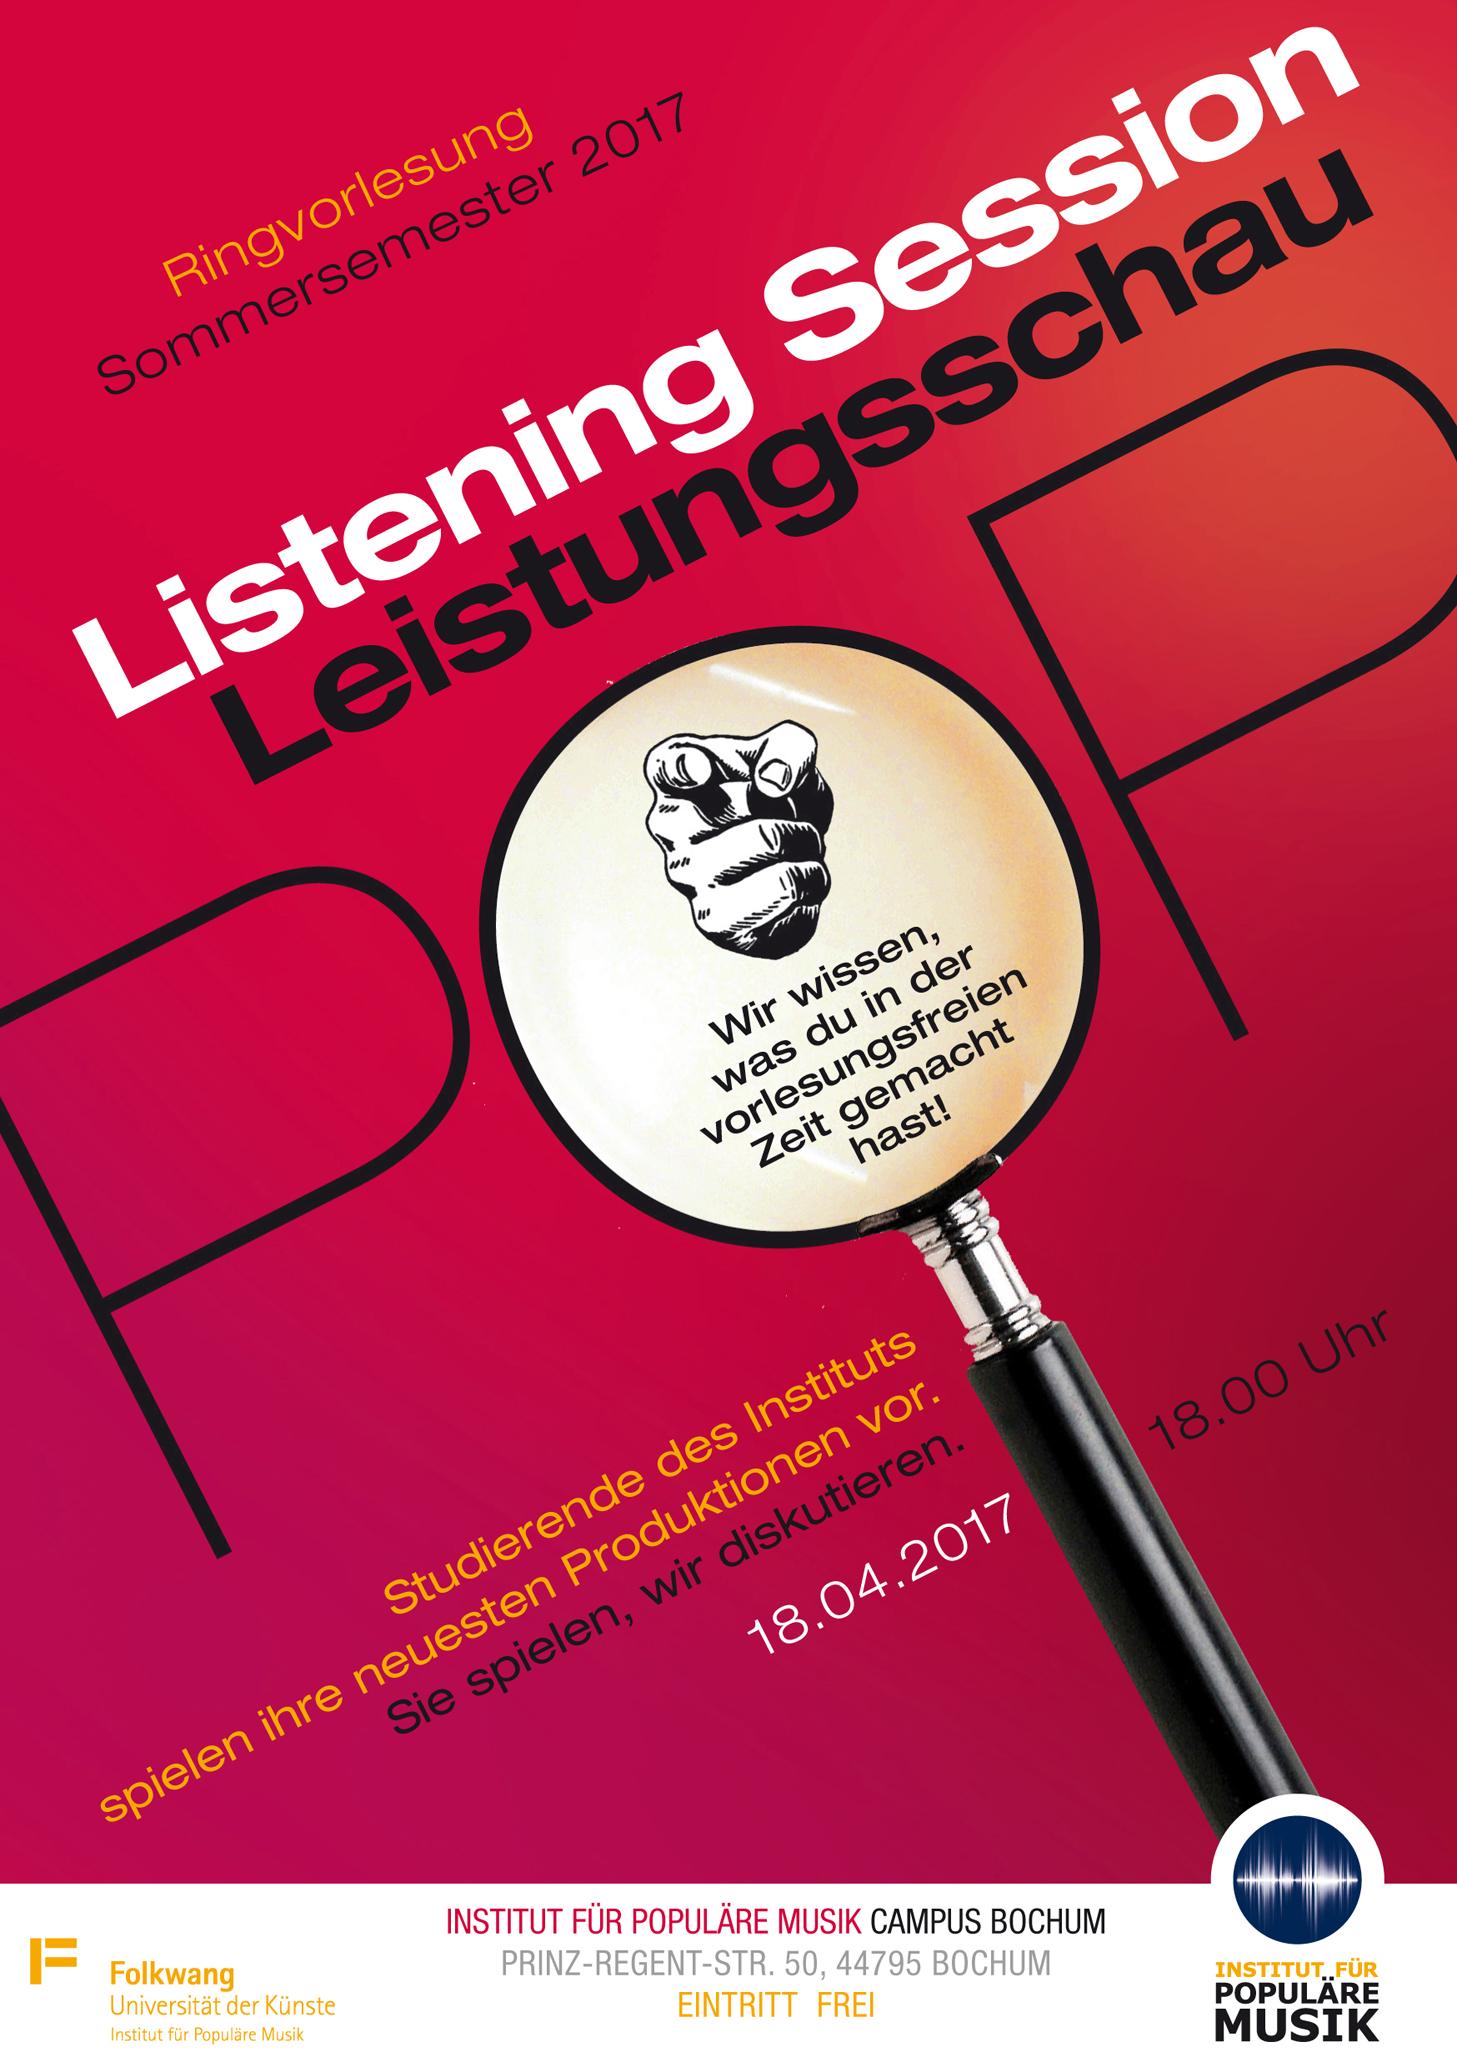 Listening Session